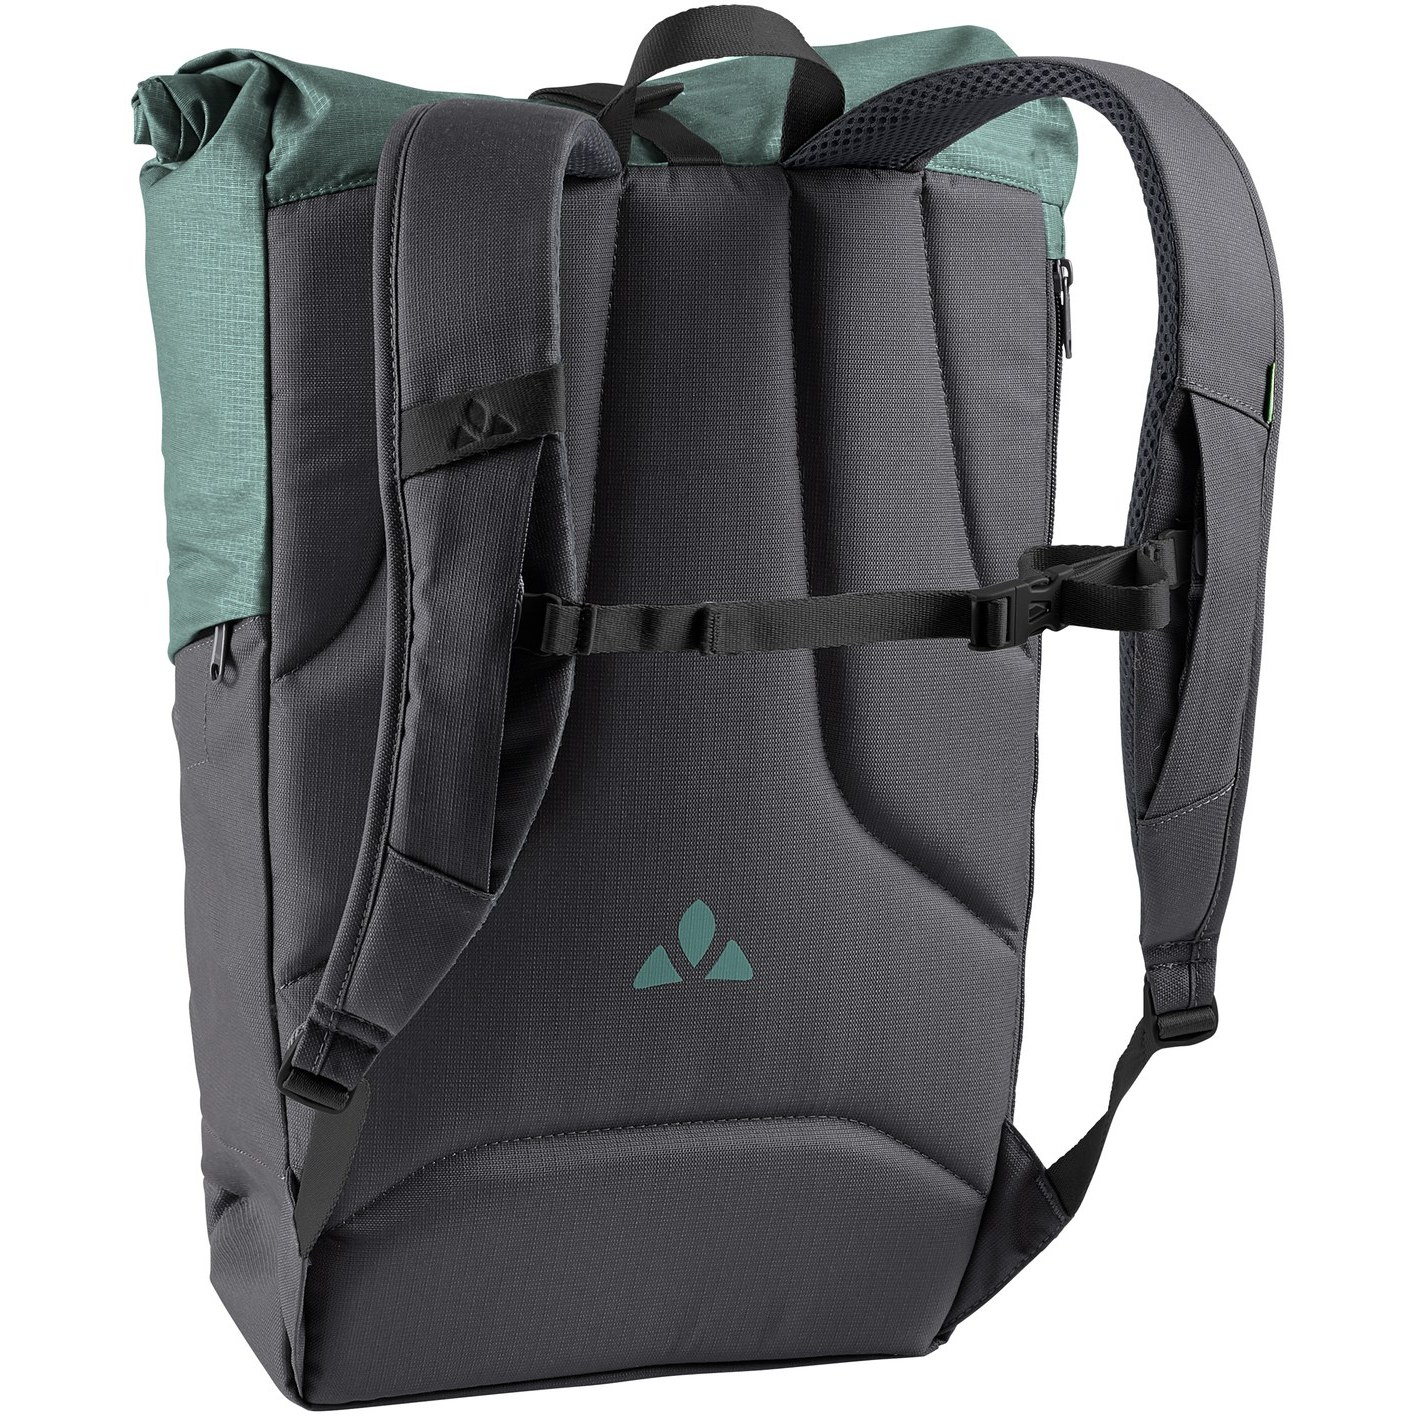 Image of Vaude Okab Backpack - black/dusty forest